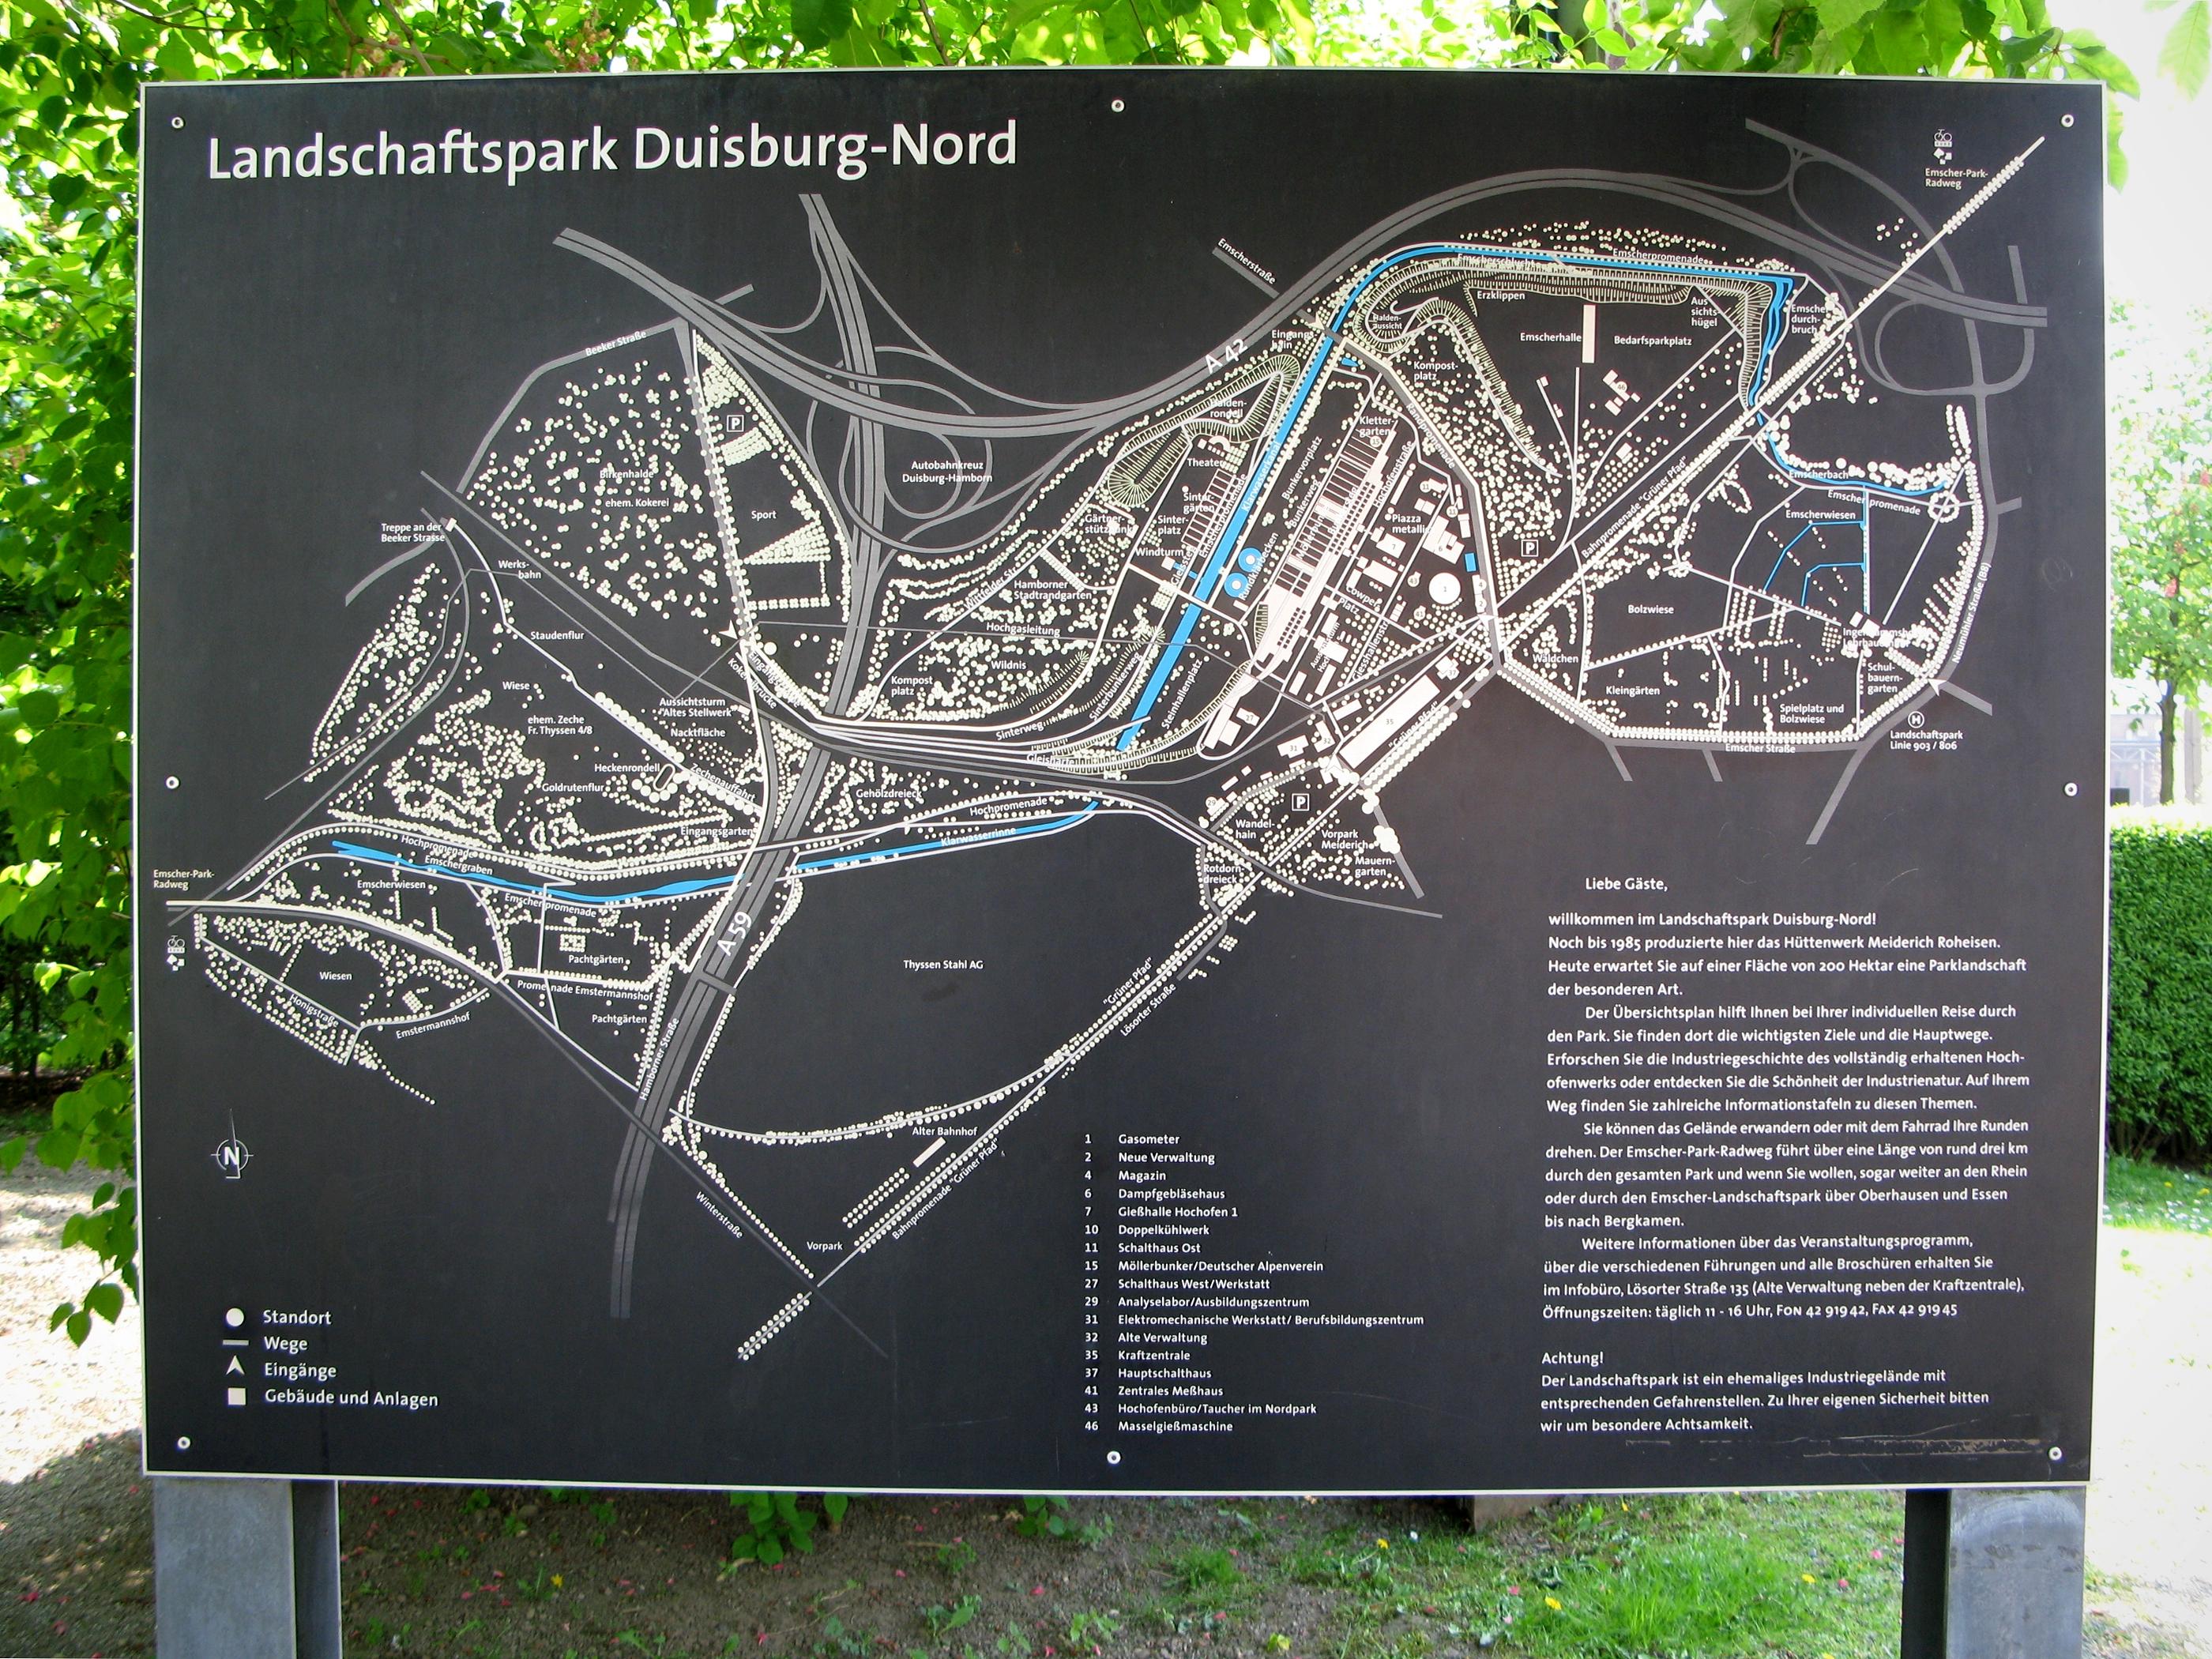 FileLandschaftspark DuisburgNord Lageplanjpg Wikimedia Commons